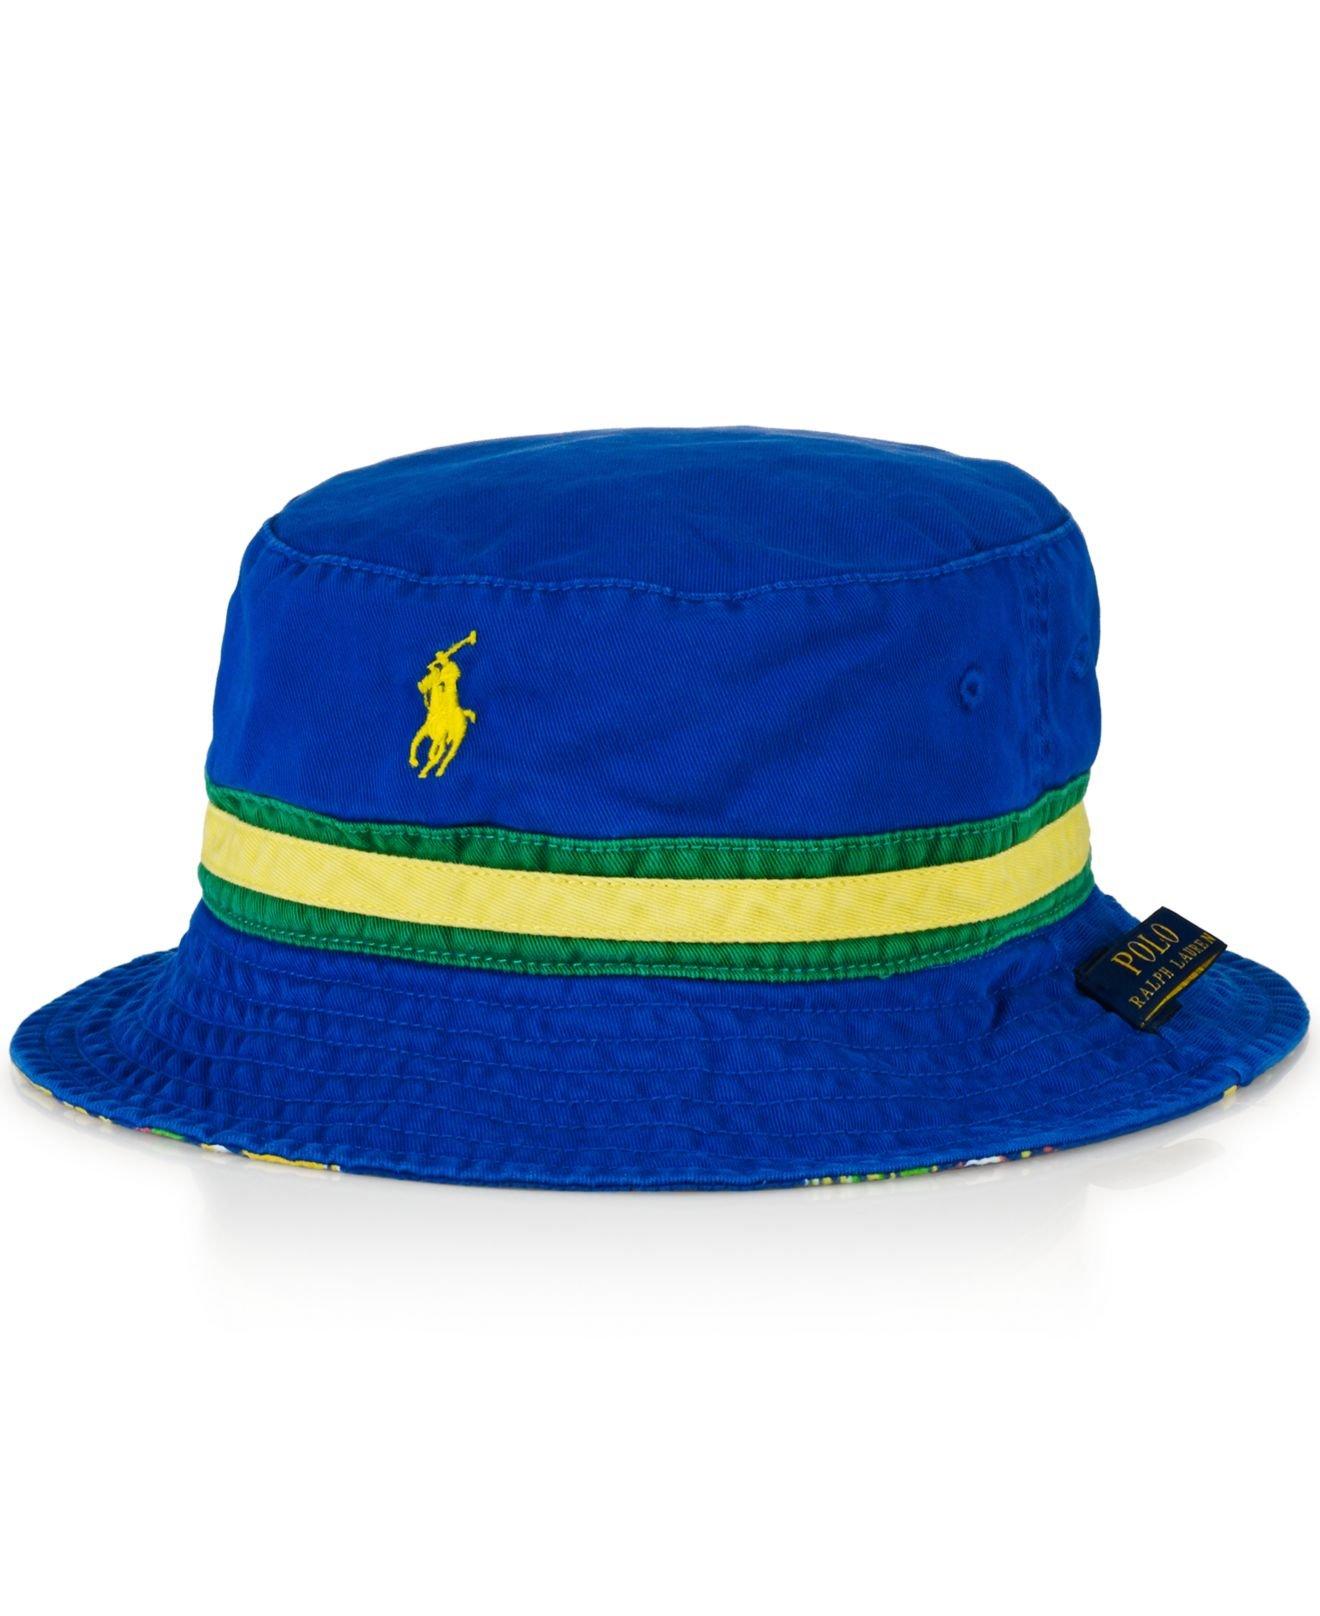 0b8be316b08 Lyst - Polo Ralph Lauren Reversible Bucket Hat in Blue for Men